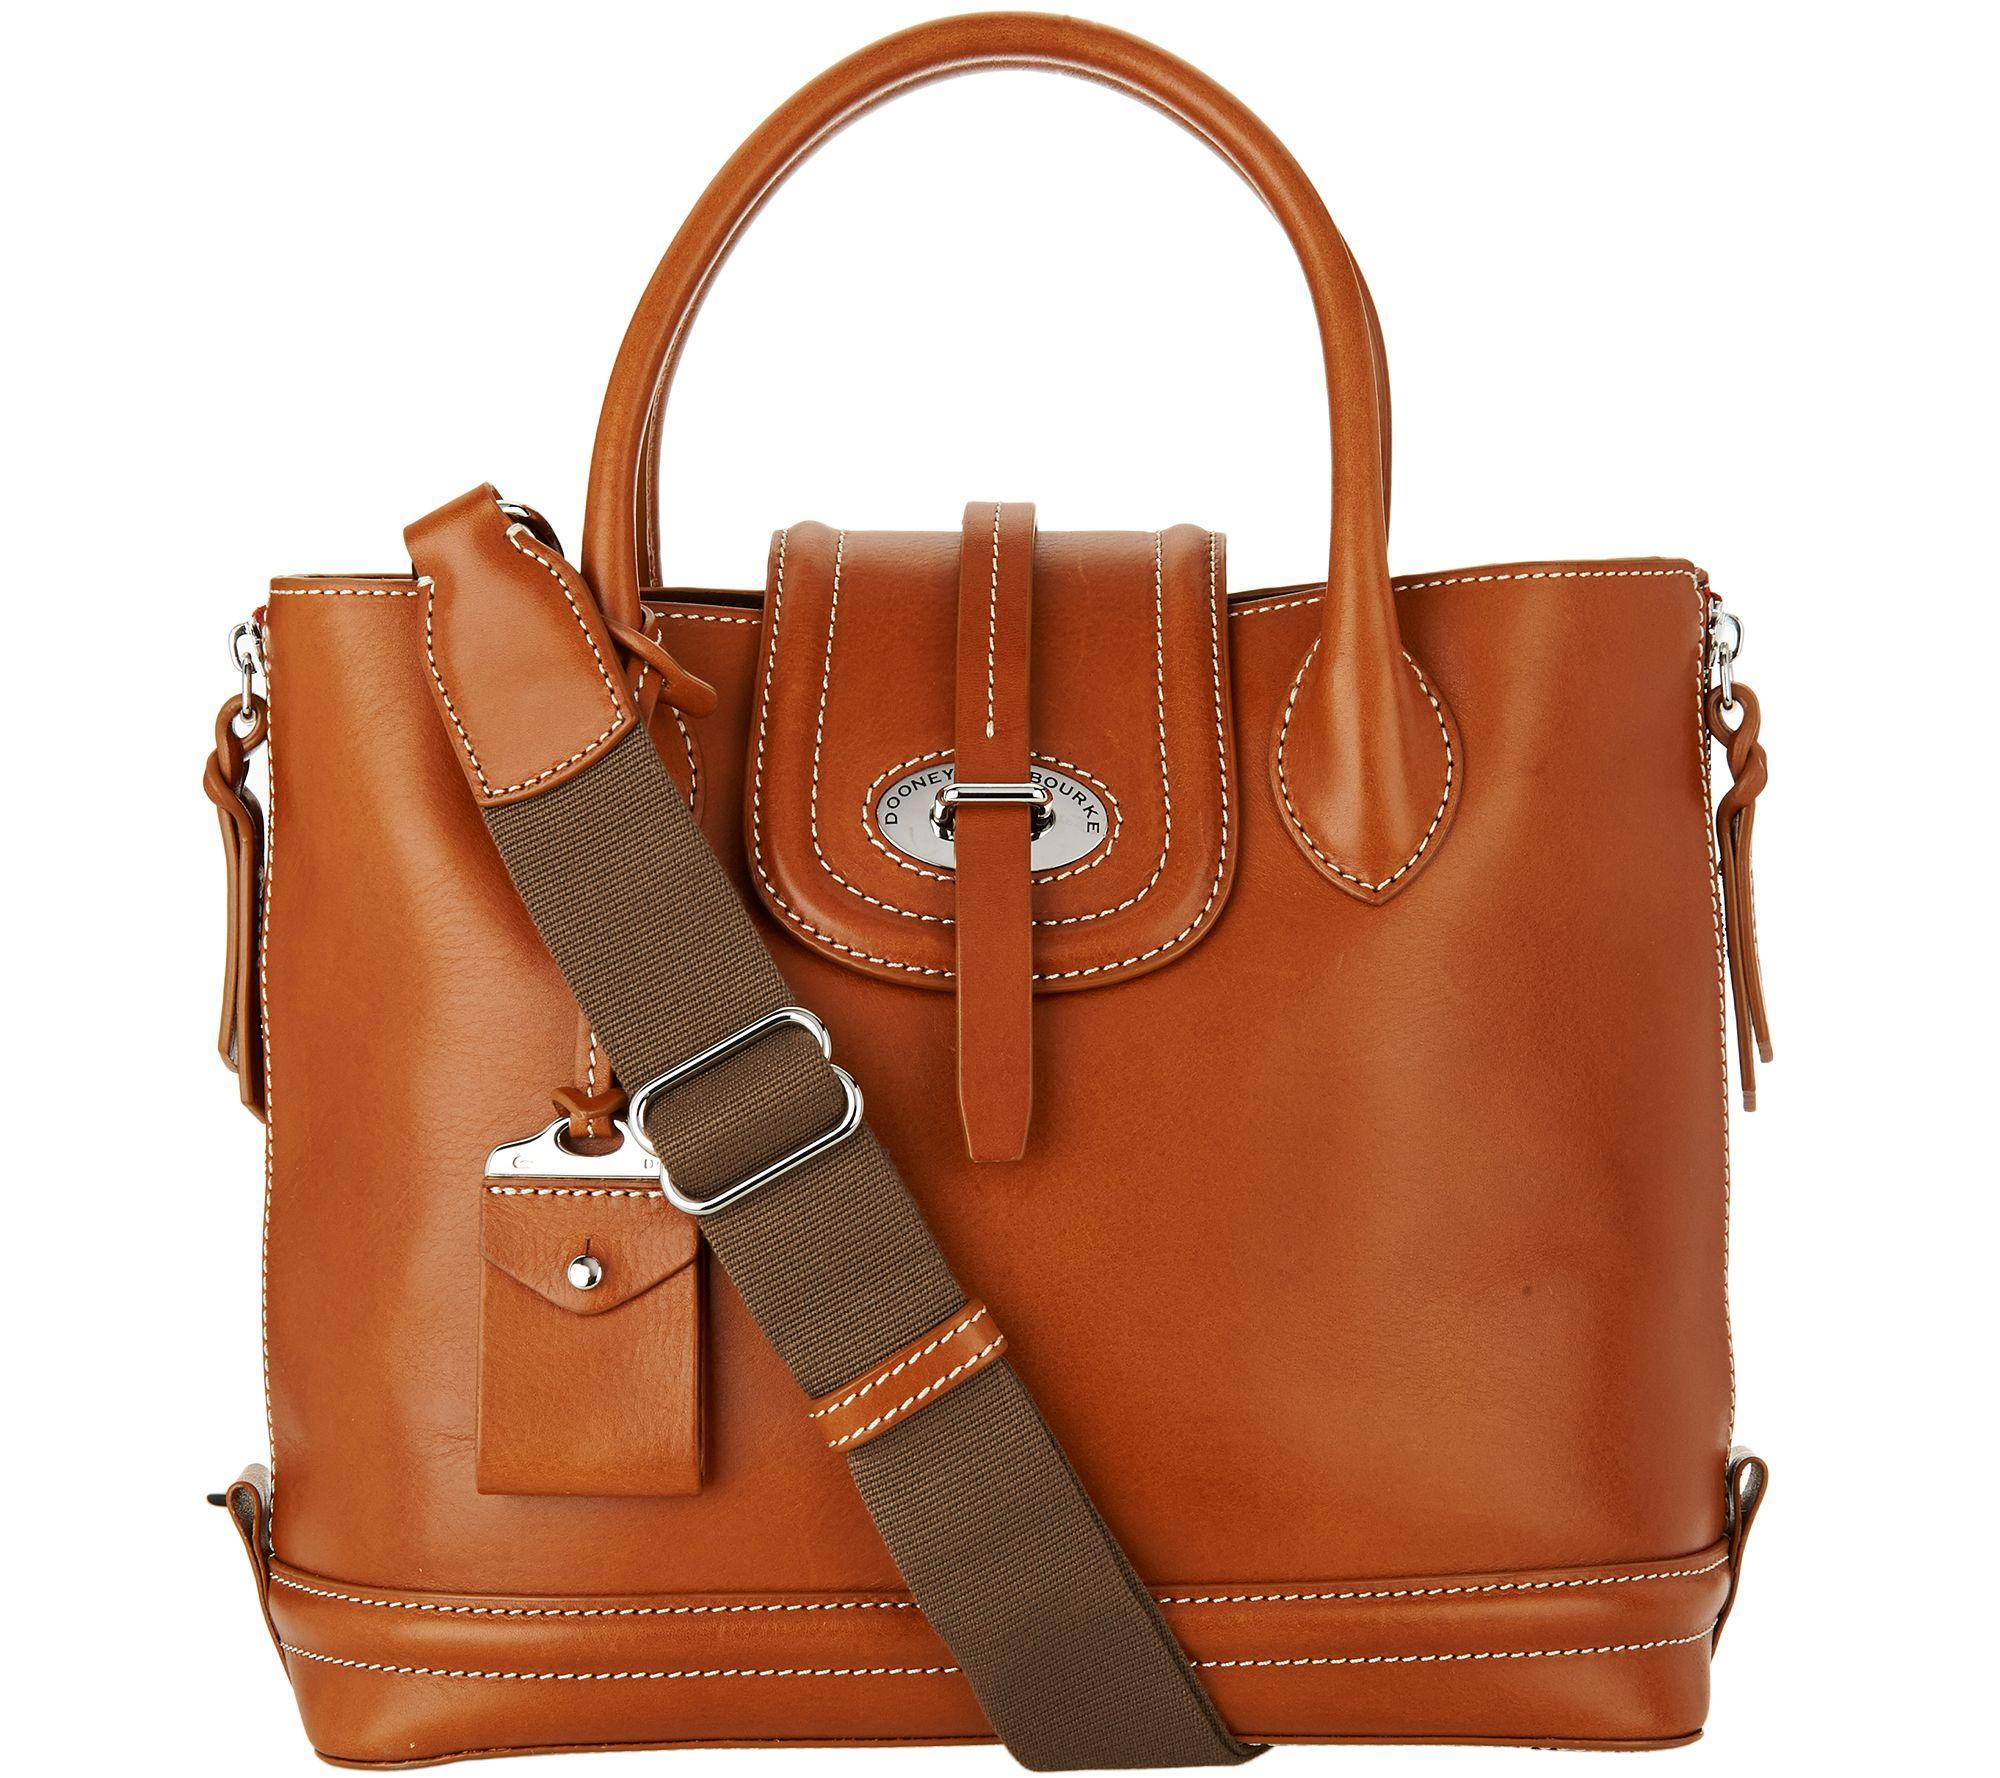 Qvc Com Dooney And Bourke Sale Hand Bags Jaguar Clubs Of